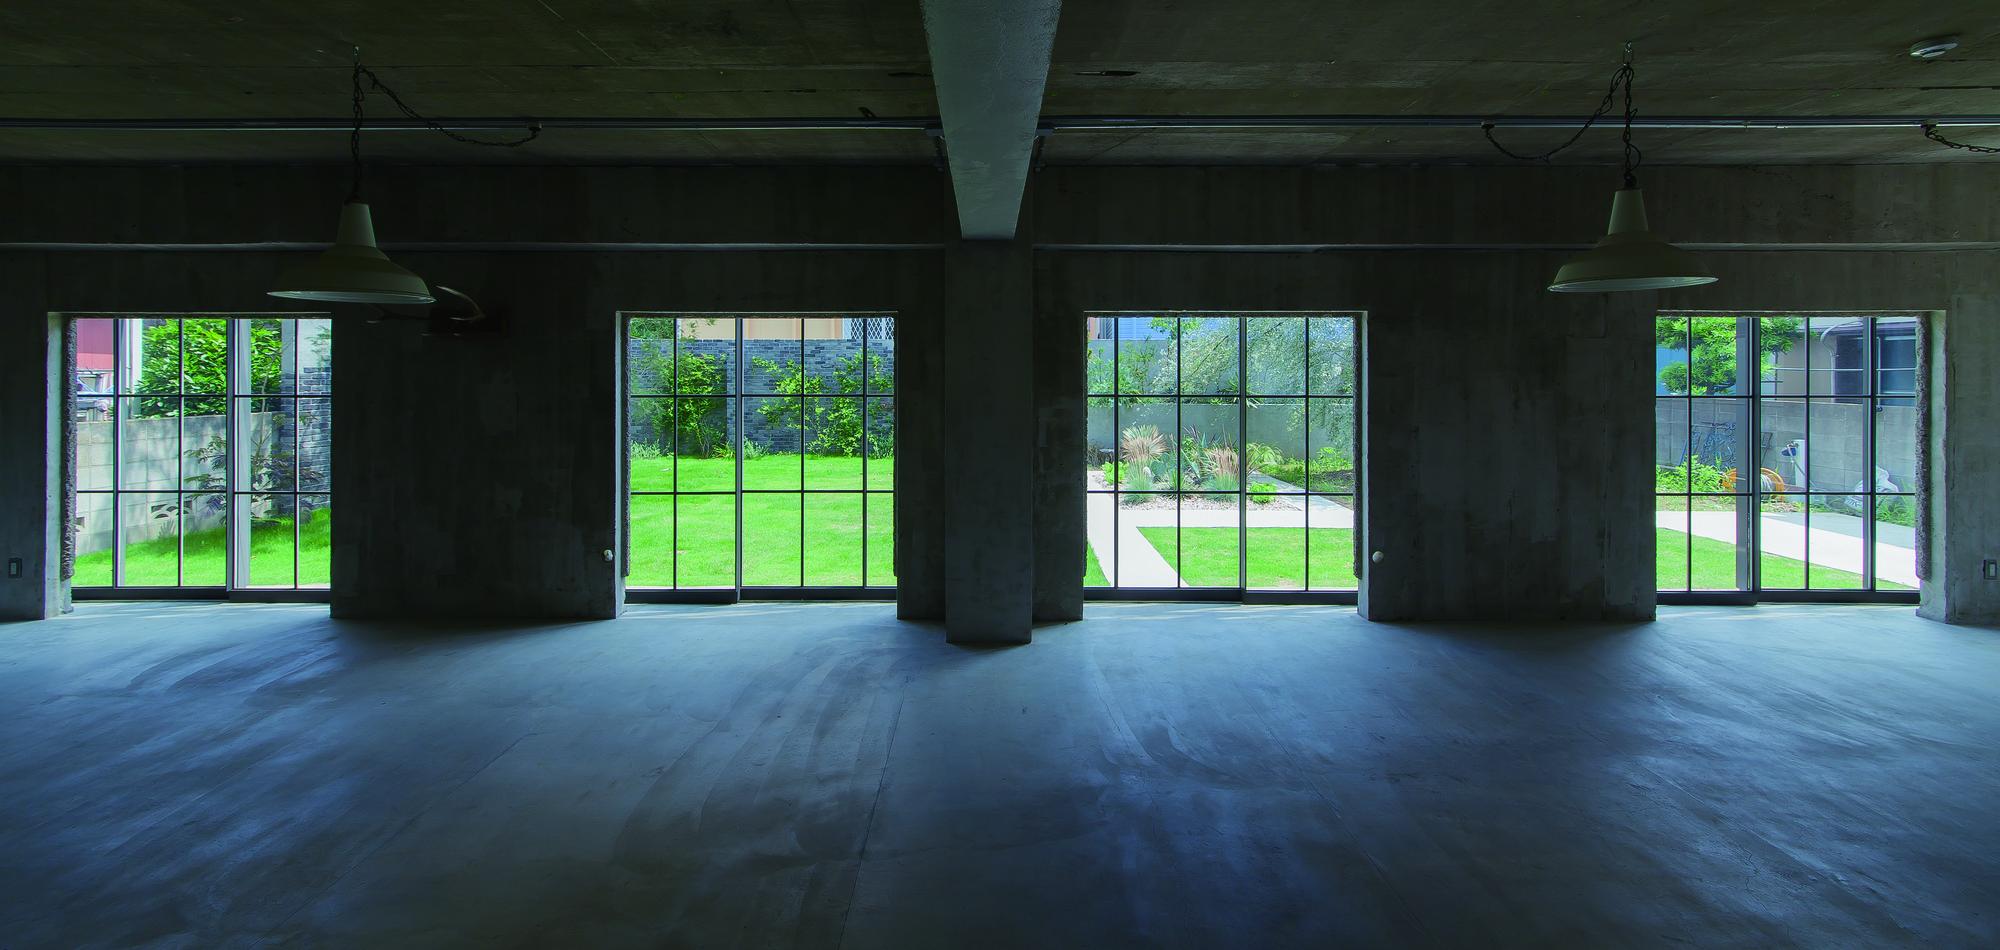 """Ventana frontera"" de Masuda + Otsubo. Imágen cortesía de Shingo Masuda + Katsuhisa Otsubo Architects"